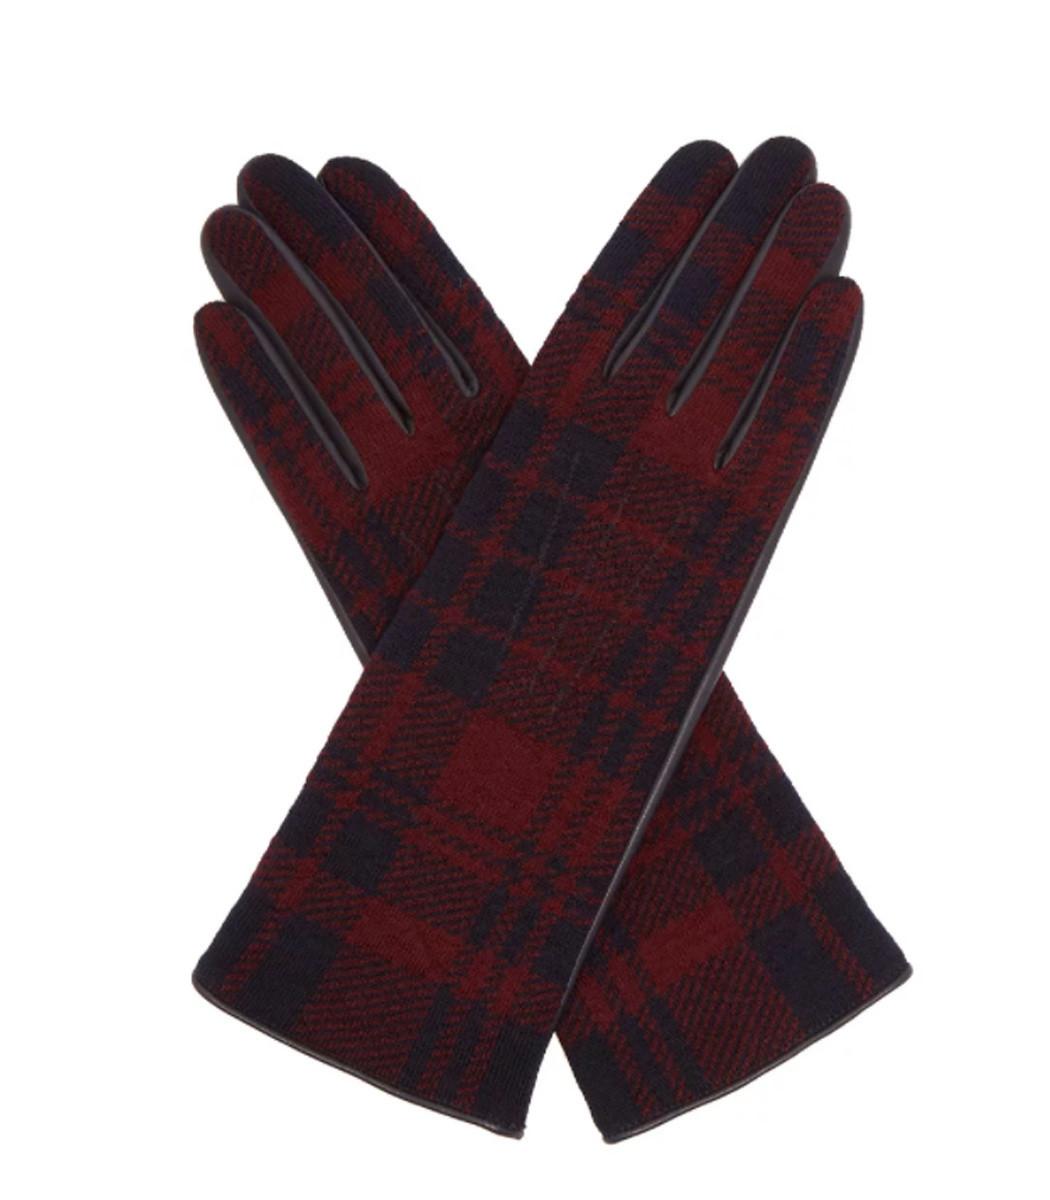 Sonia Rykiel Tartan Wool and Leather Gloves